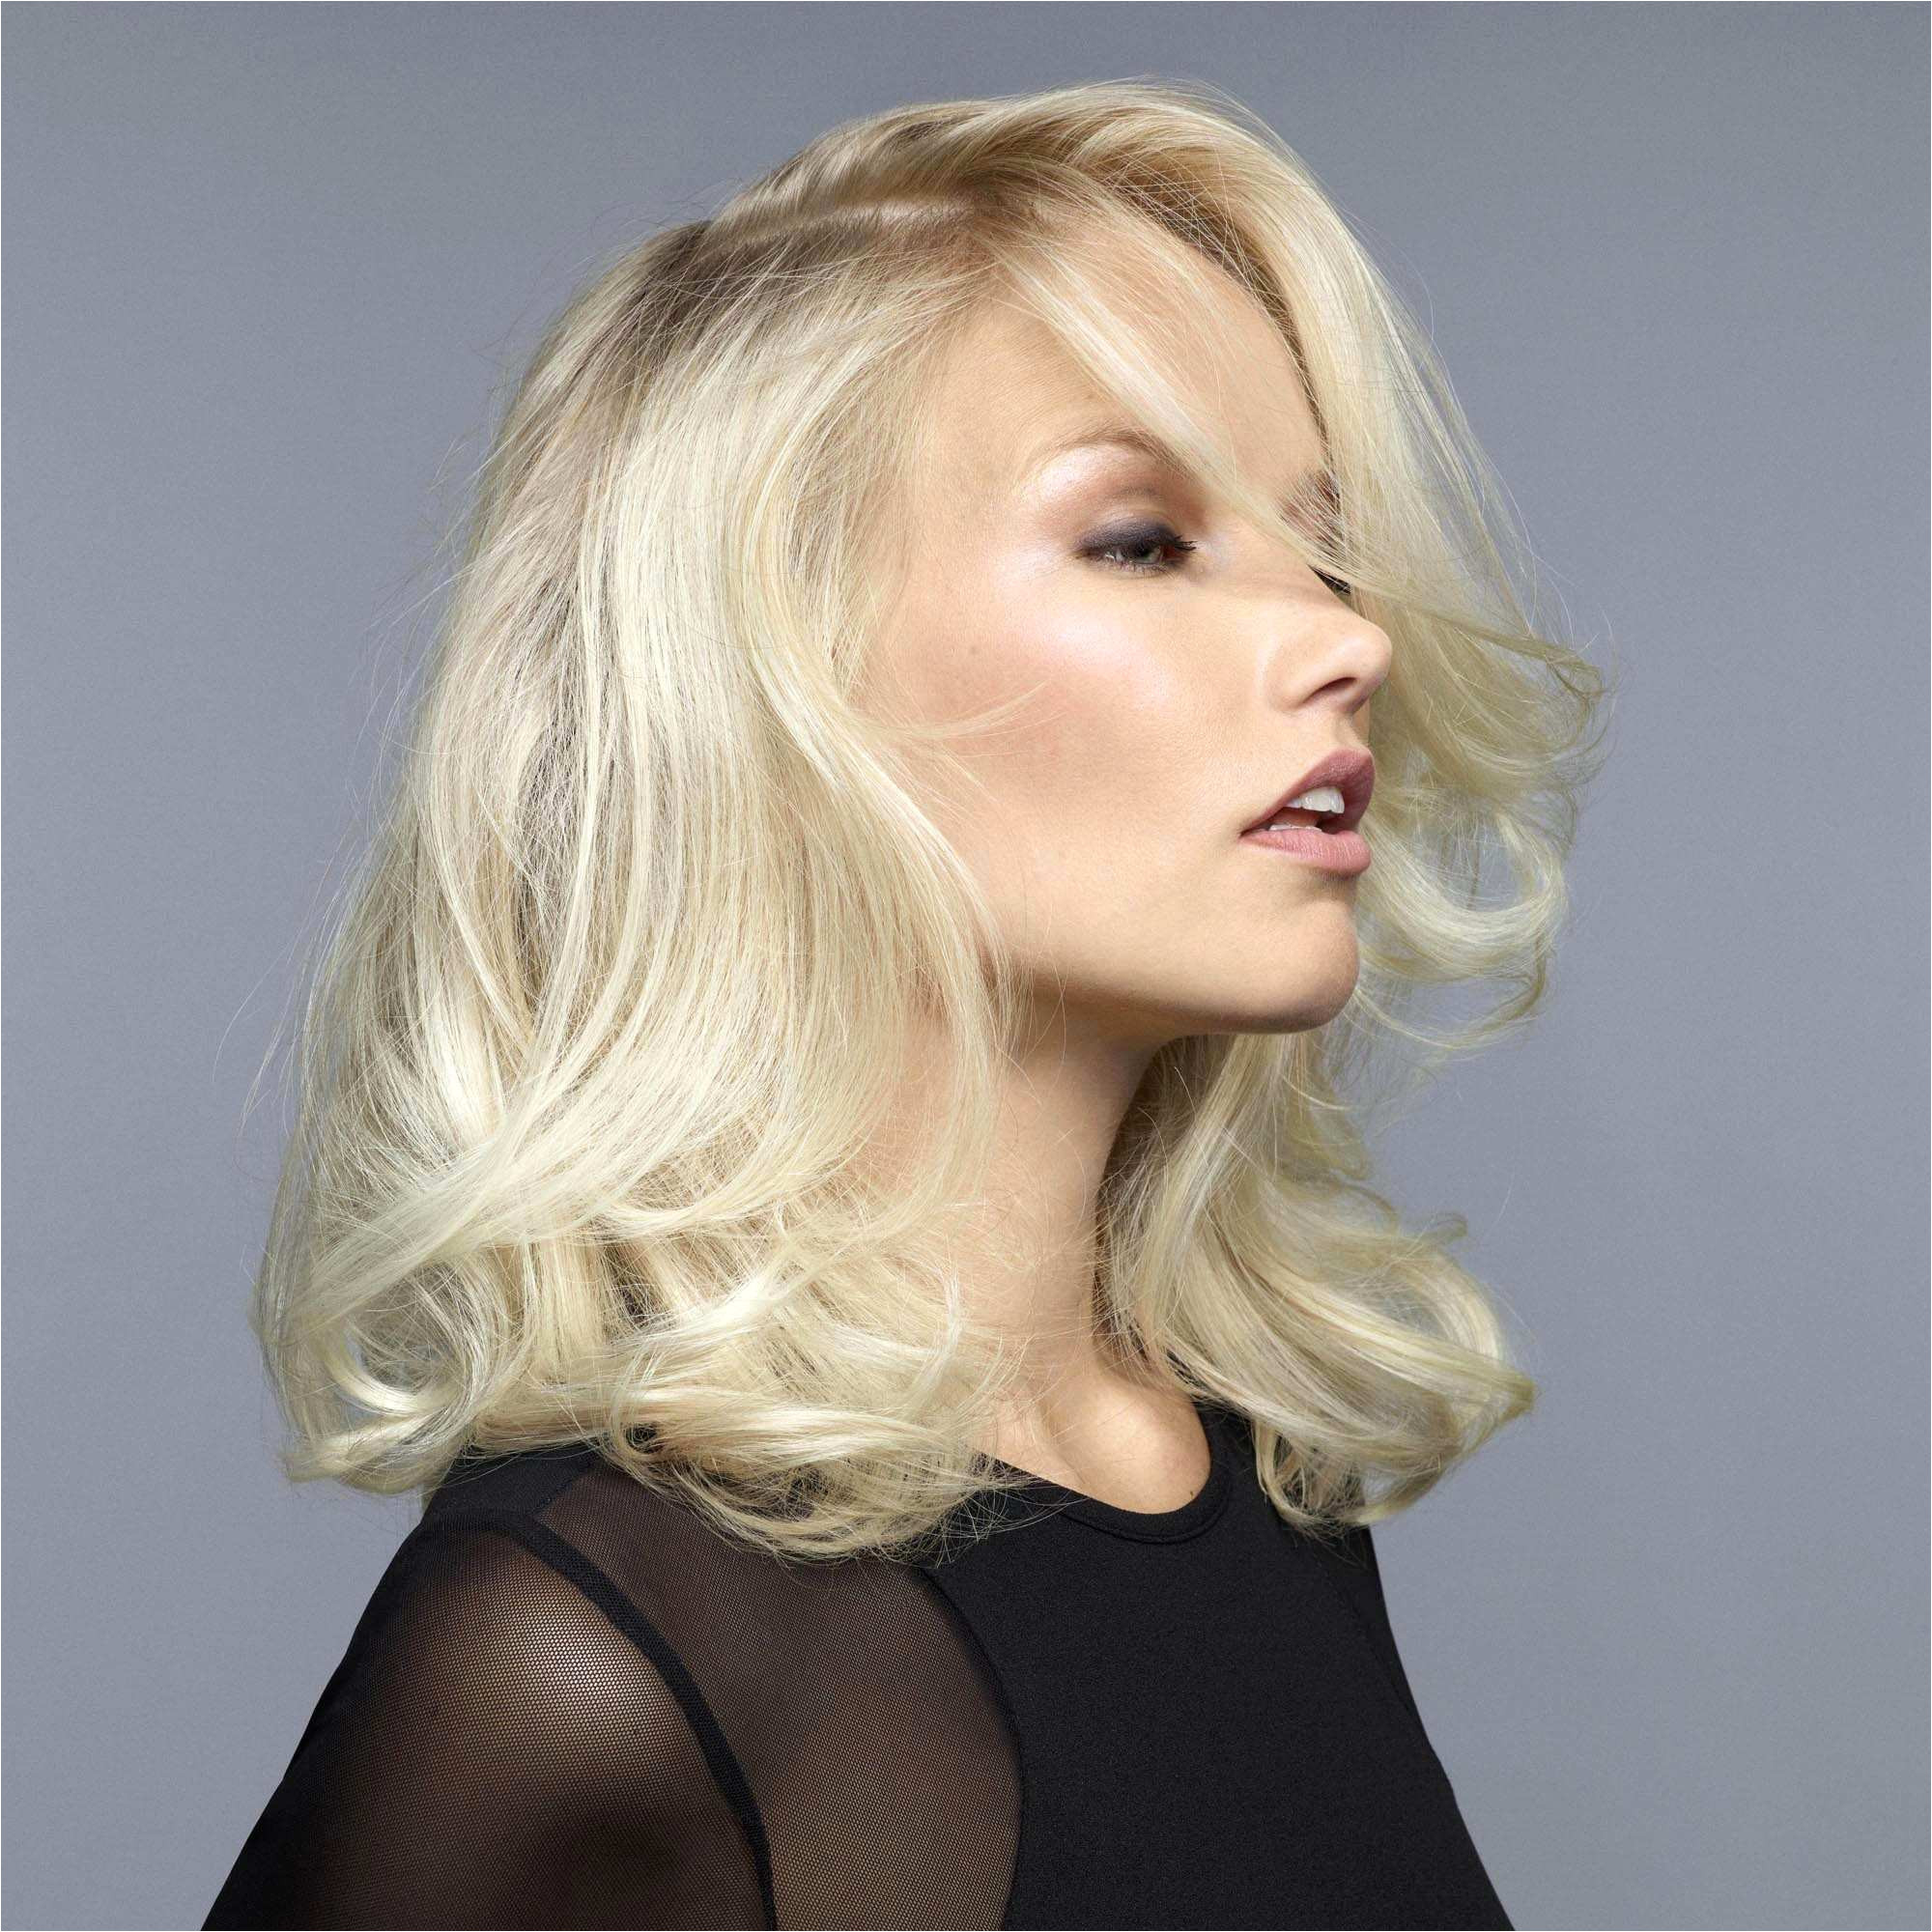 Seventimesbrighter · Hairstyles For Blonde Girls Elegant Blonde Braids Hairstyles Beautiful Exciting Big Braids Hairstyles